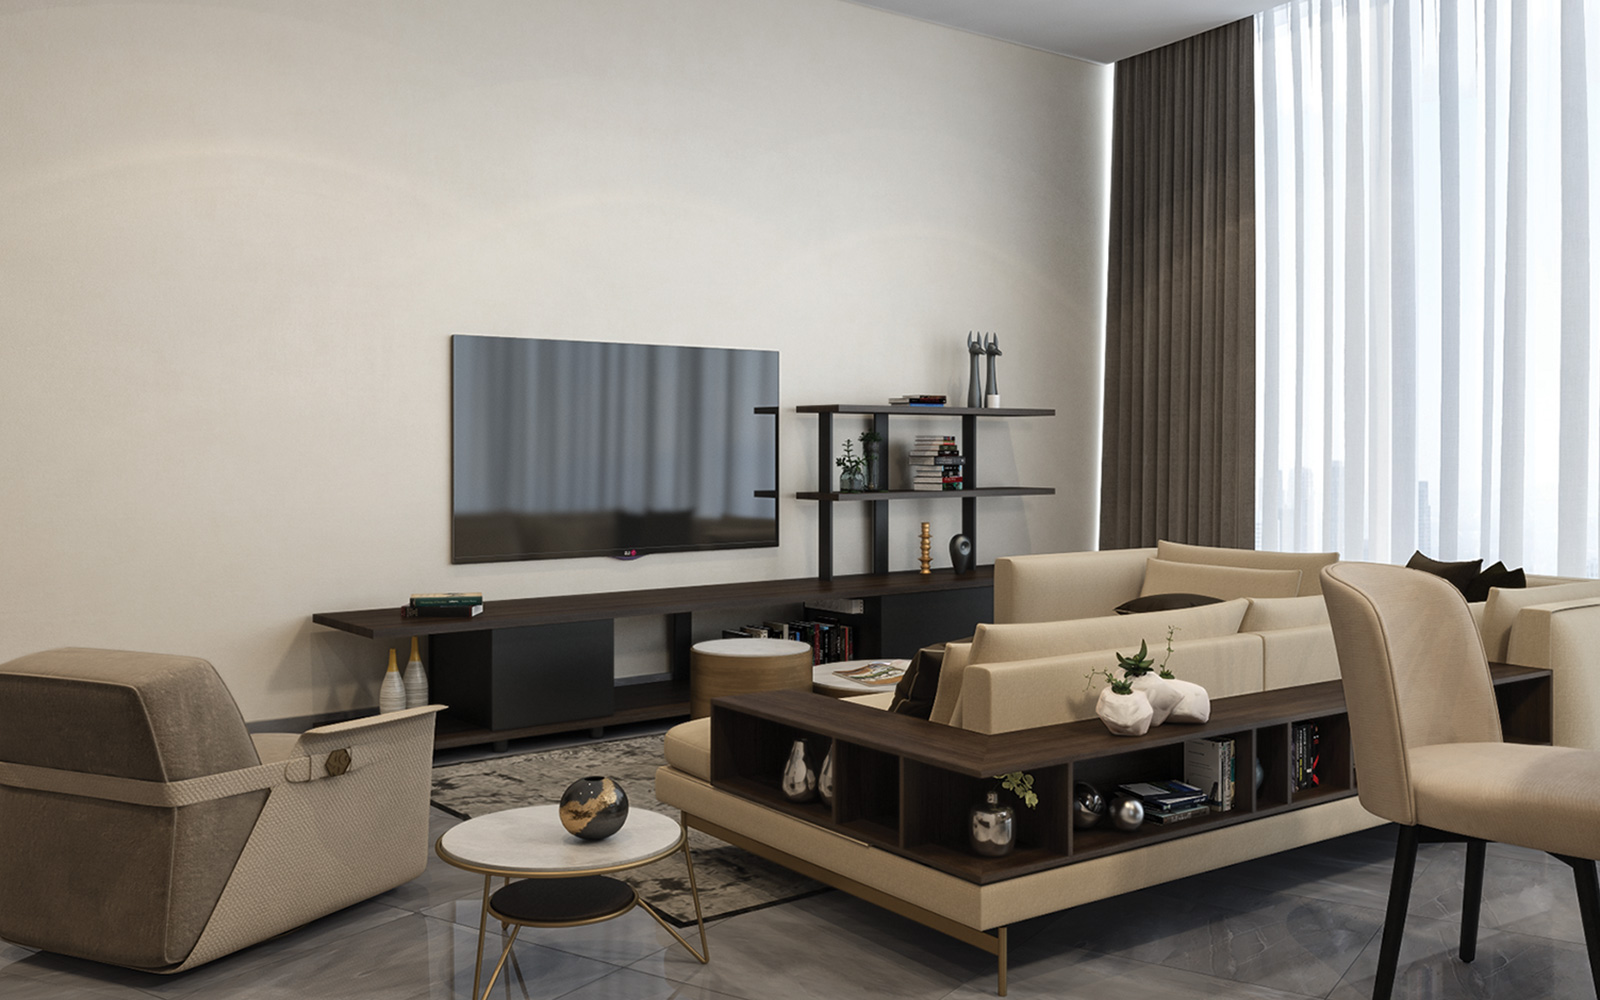 Vogue Design - Saudi Arabia Beyat Plaza7